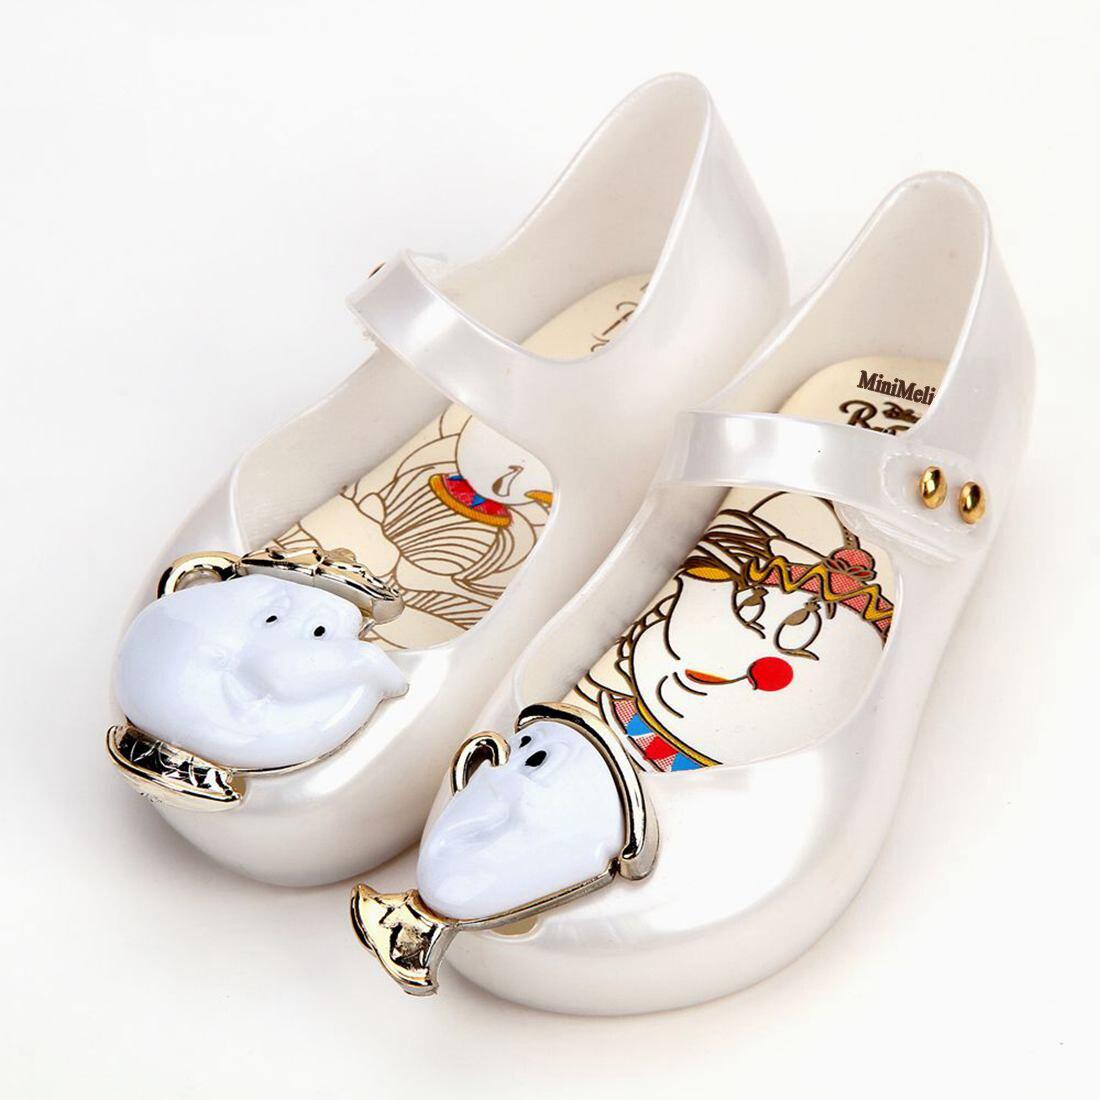 Mini Melissa Teacup Sandals 2018hot New Winter Kids Sandals Beauty Beast Girls Shoe Jelly Sandals Non-slip Kid Shoes